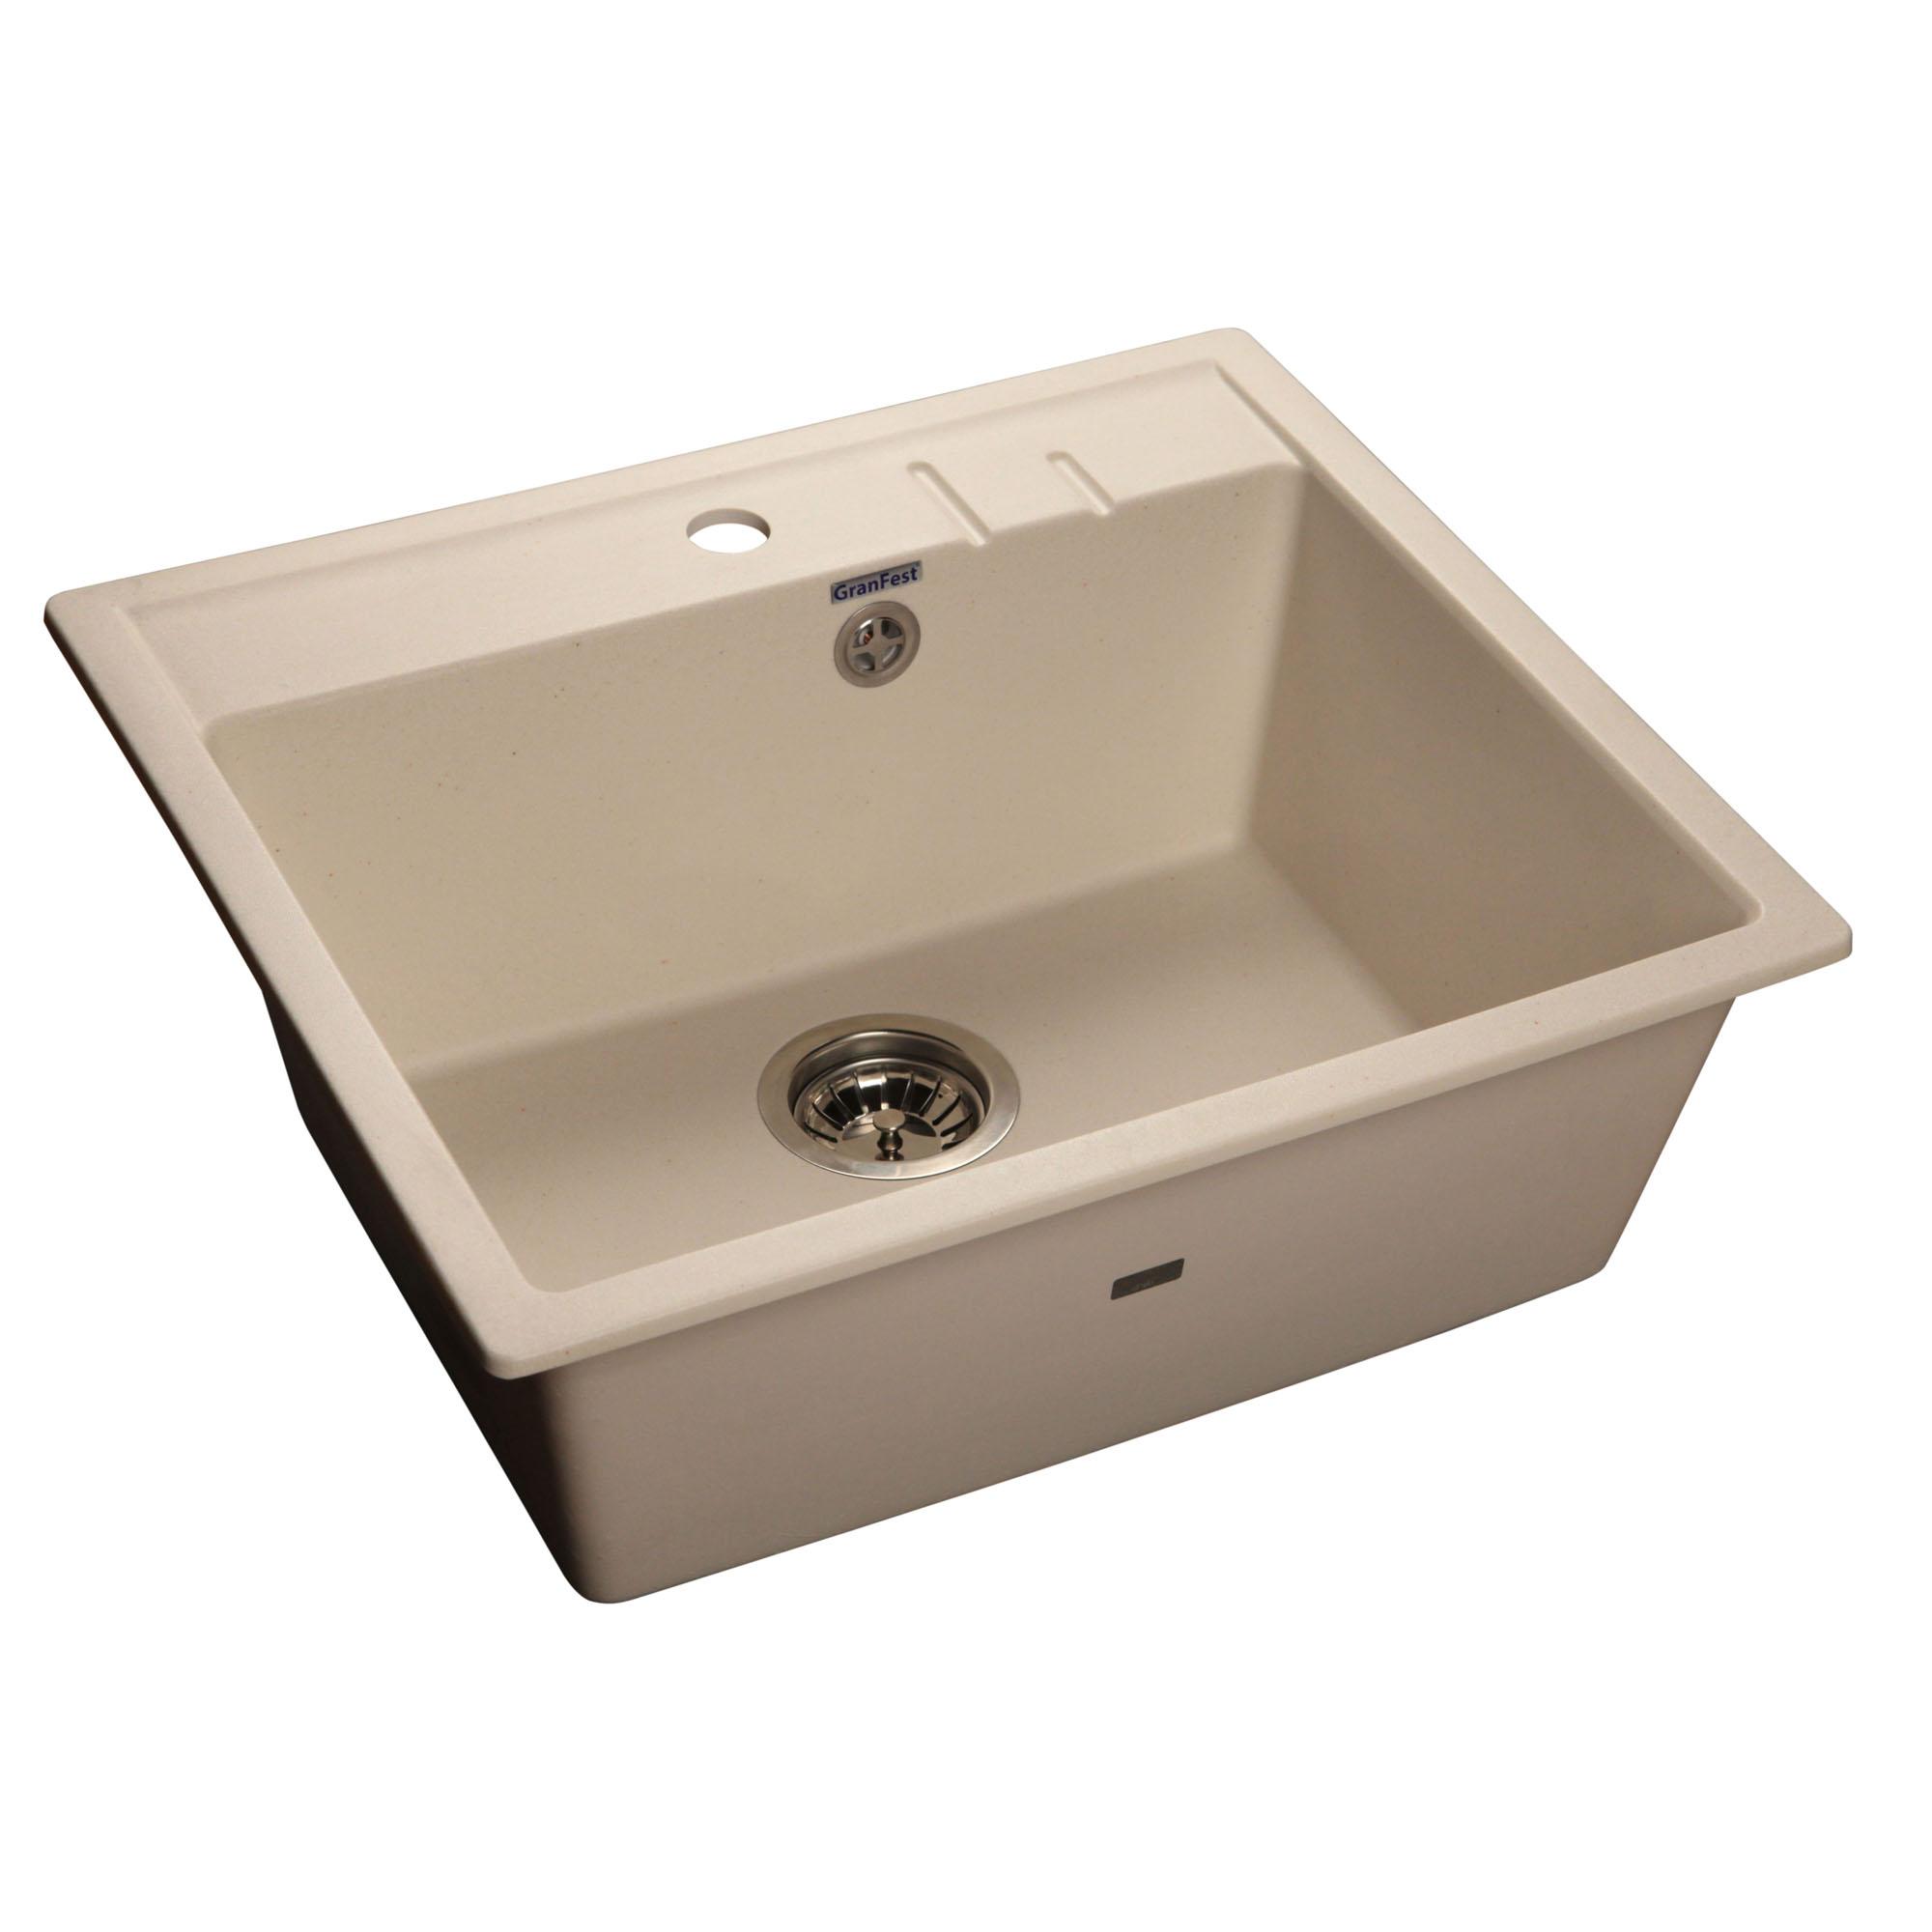 Кухонная мойка GranFest Quadro GF-Q560 белый мойка кухонная granfest гранит 565x510 gf q560 песок